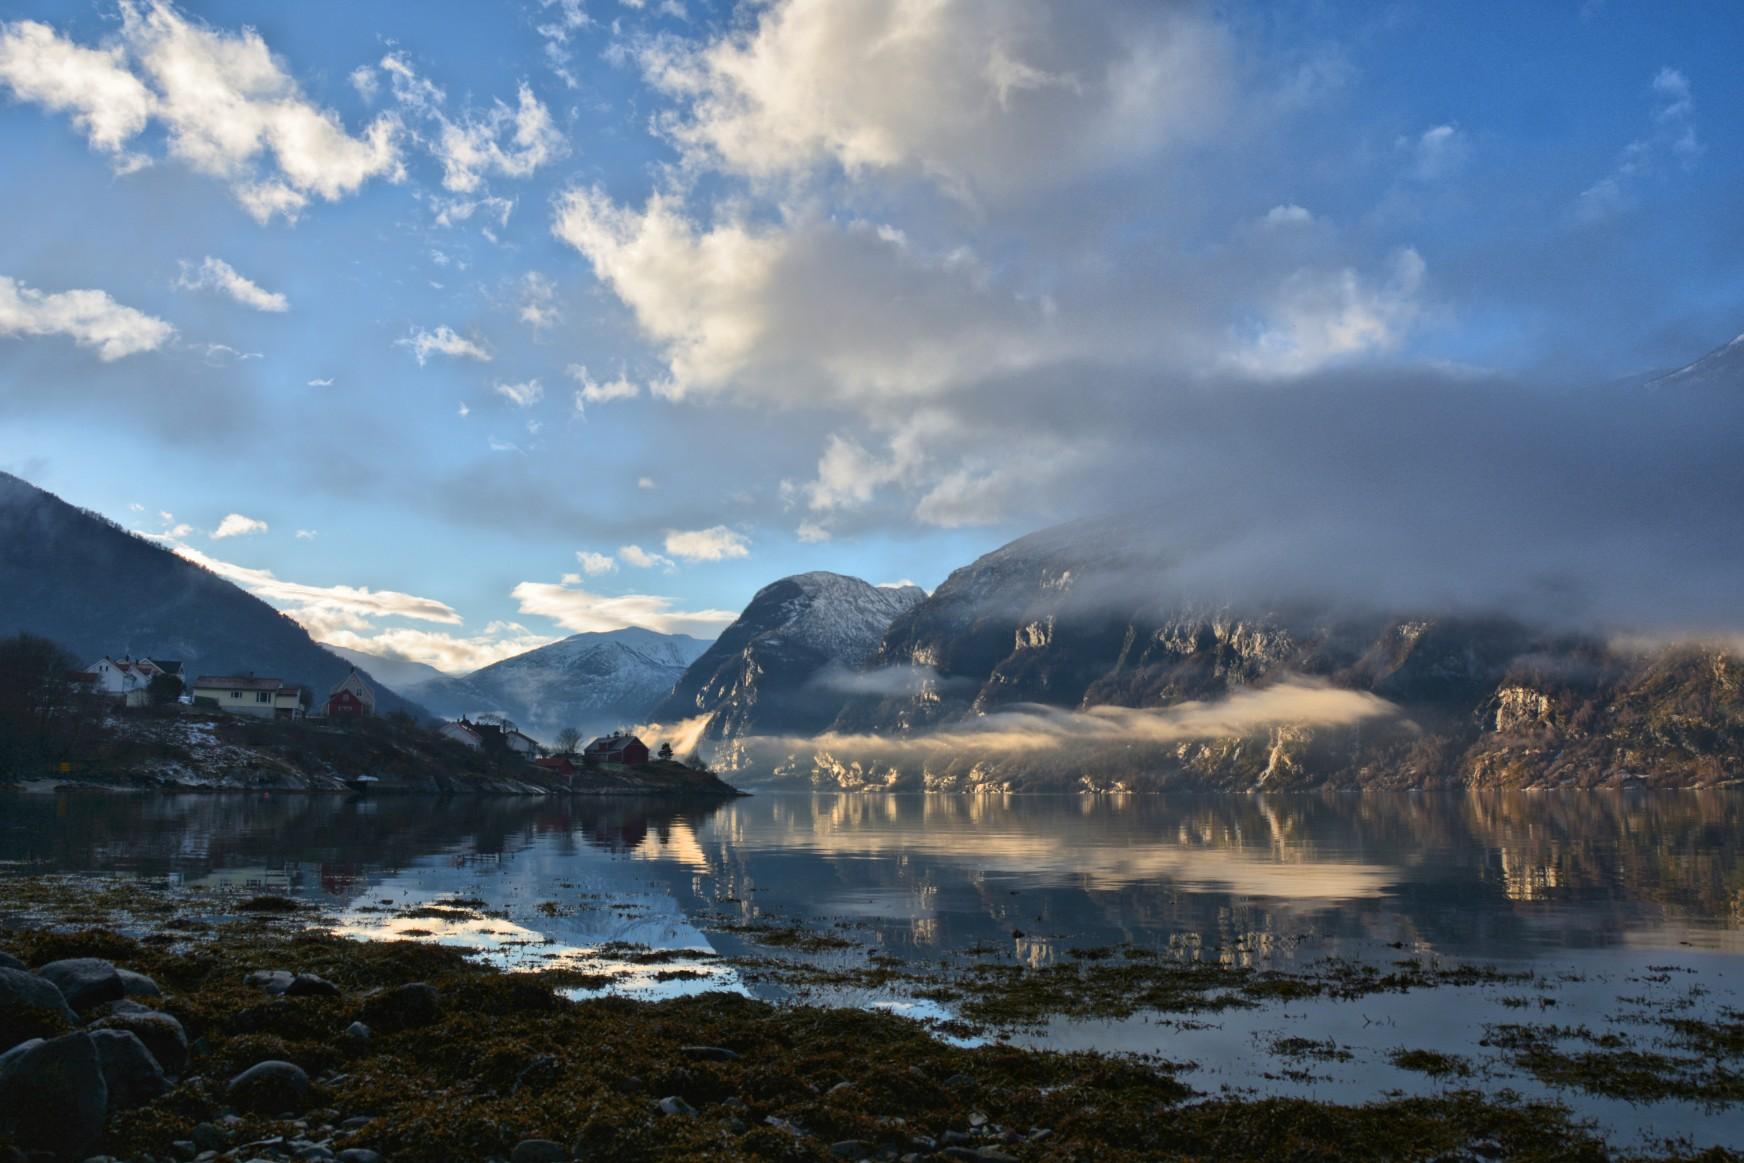 Sunset on Aurlandsfjord